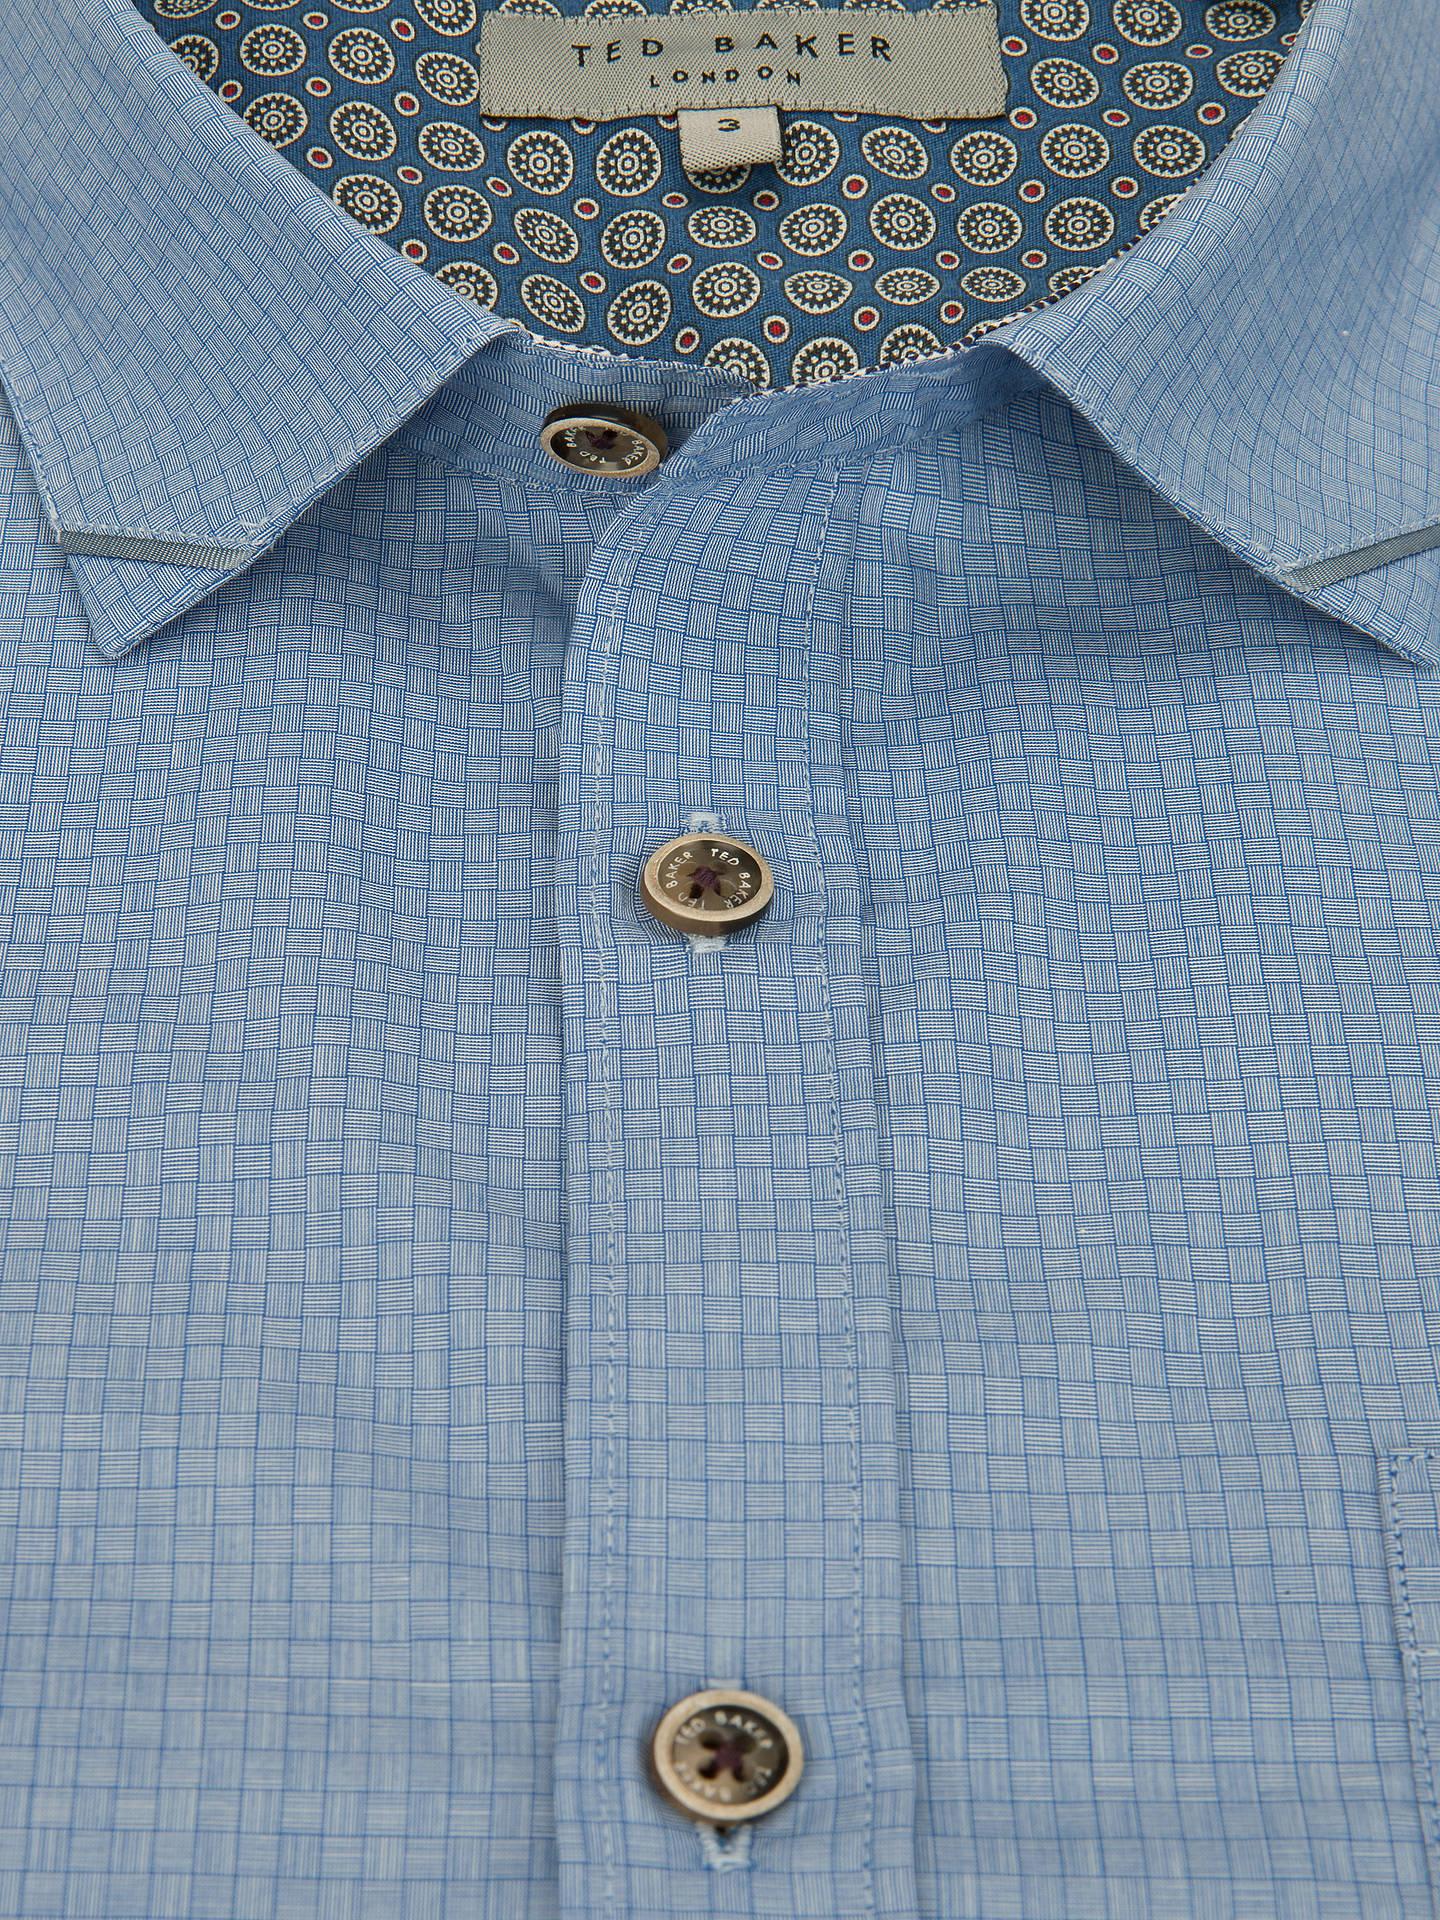 7ef66ebc95 Ted Baker Wellfly Pocket Detail Square Weave Shirt at John Lewis ...